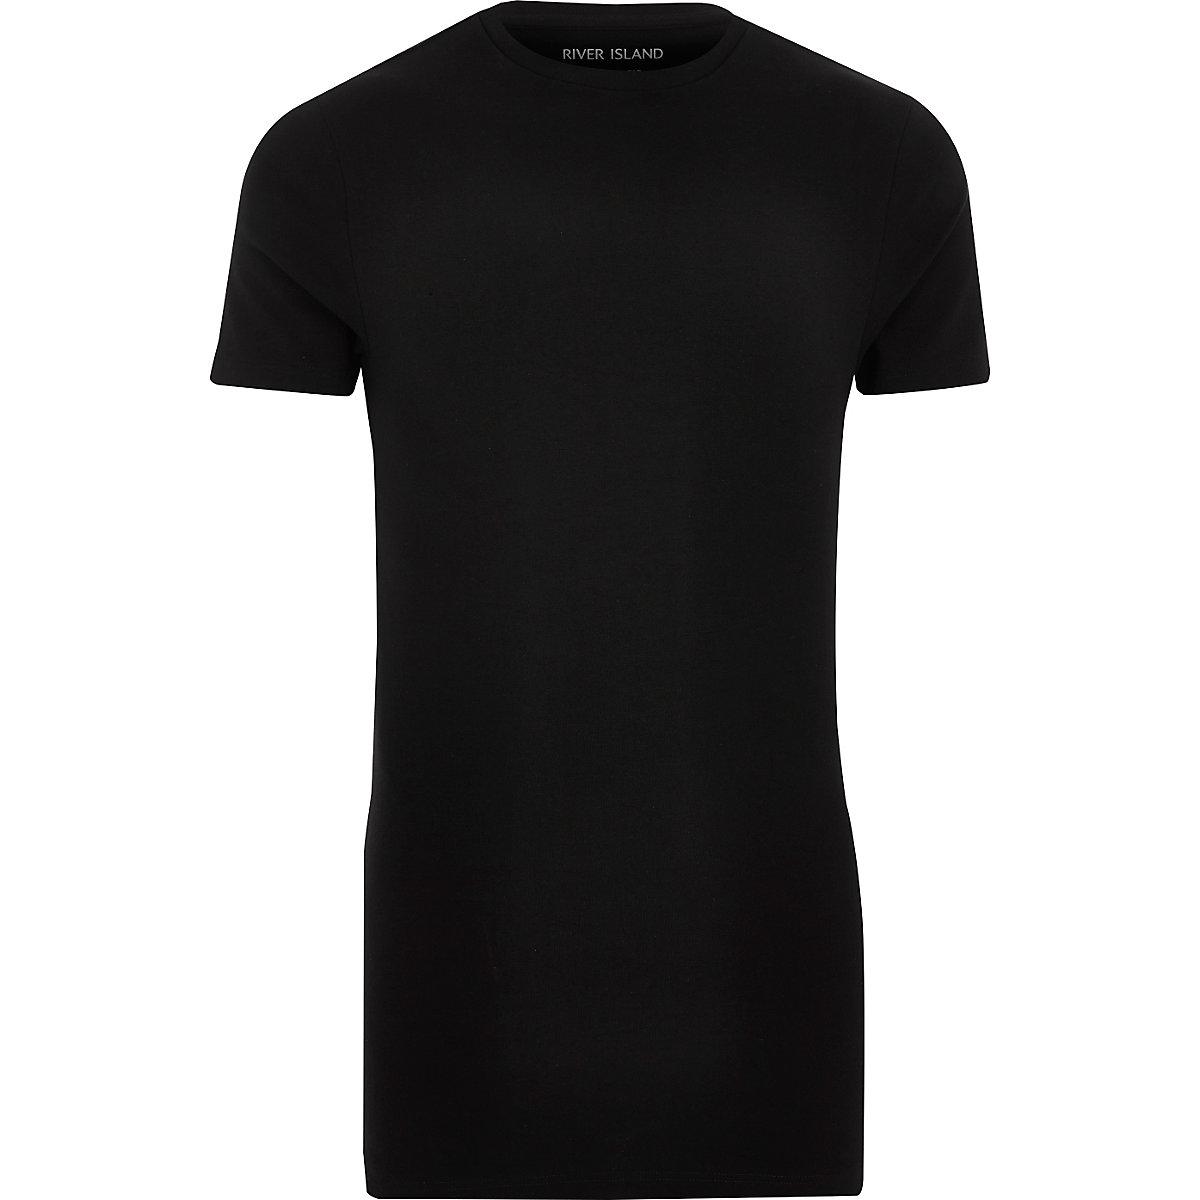 Langes schwarzes T-Shirt